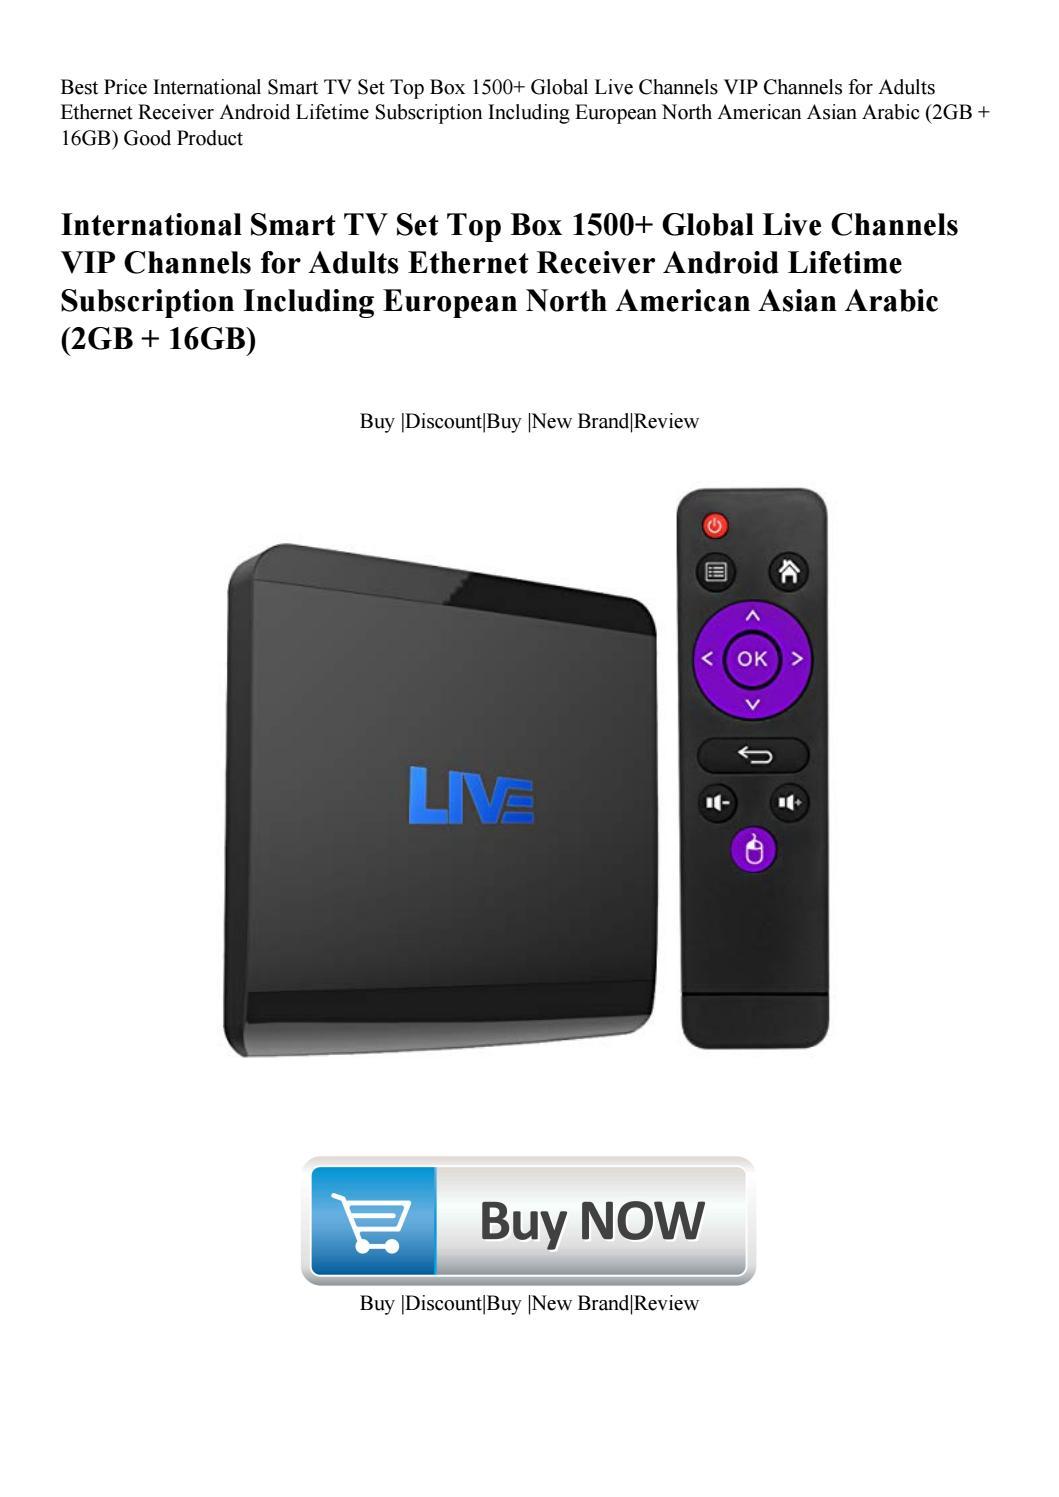 Best Price International Smart TV Set Top Box 1500+ Global